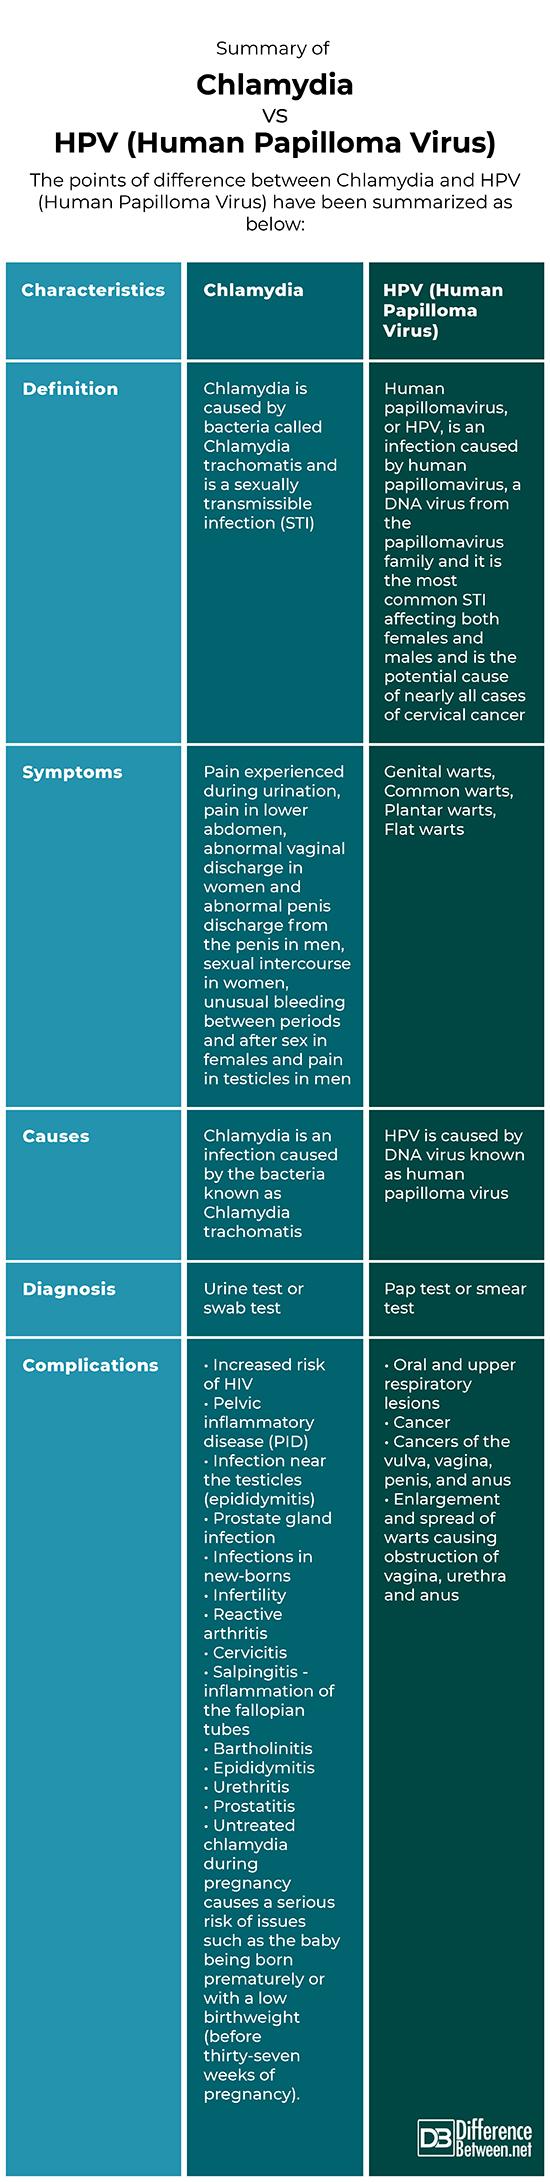 papillomavirus infection complications)